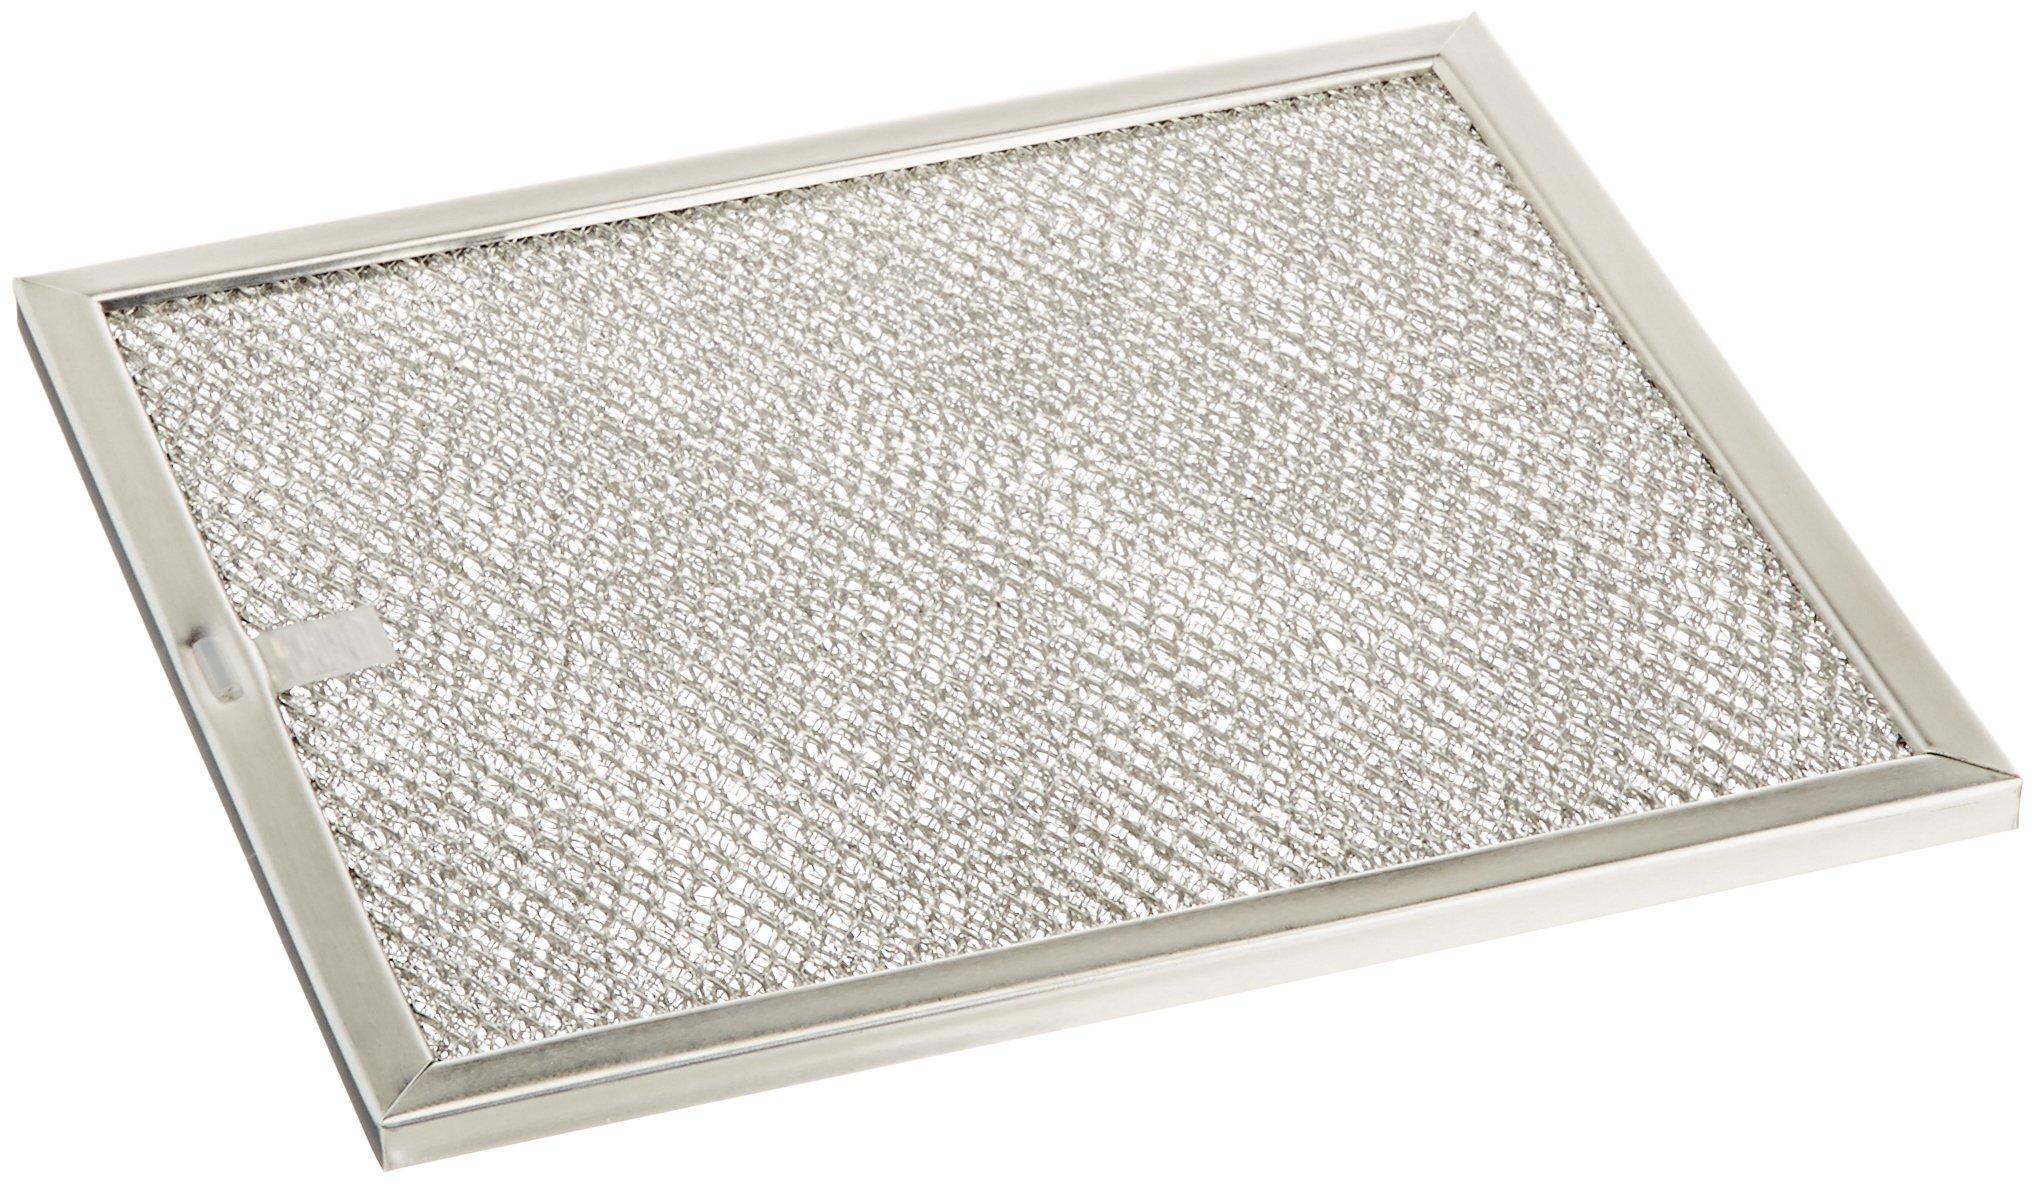 Broan SV03509 Aluminum Filter, 8-15/16'' x 9-11/16''